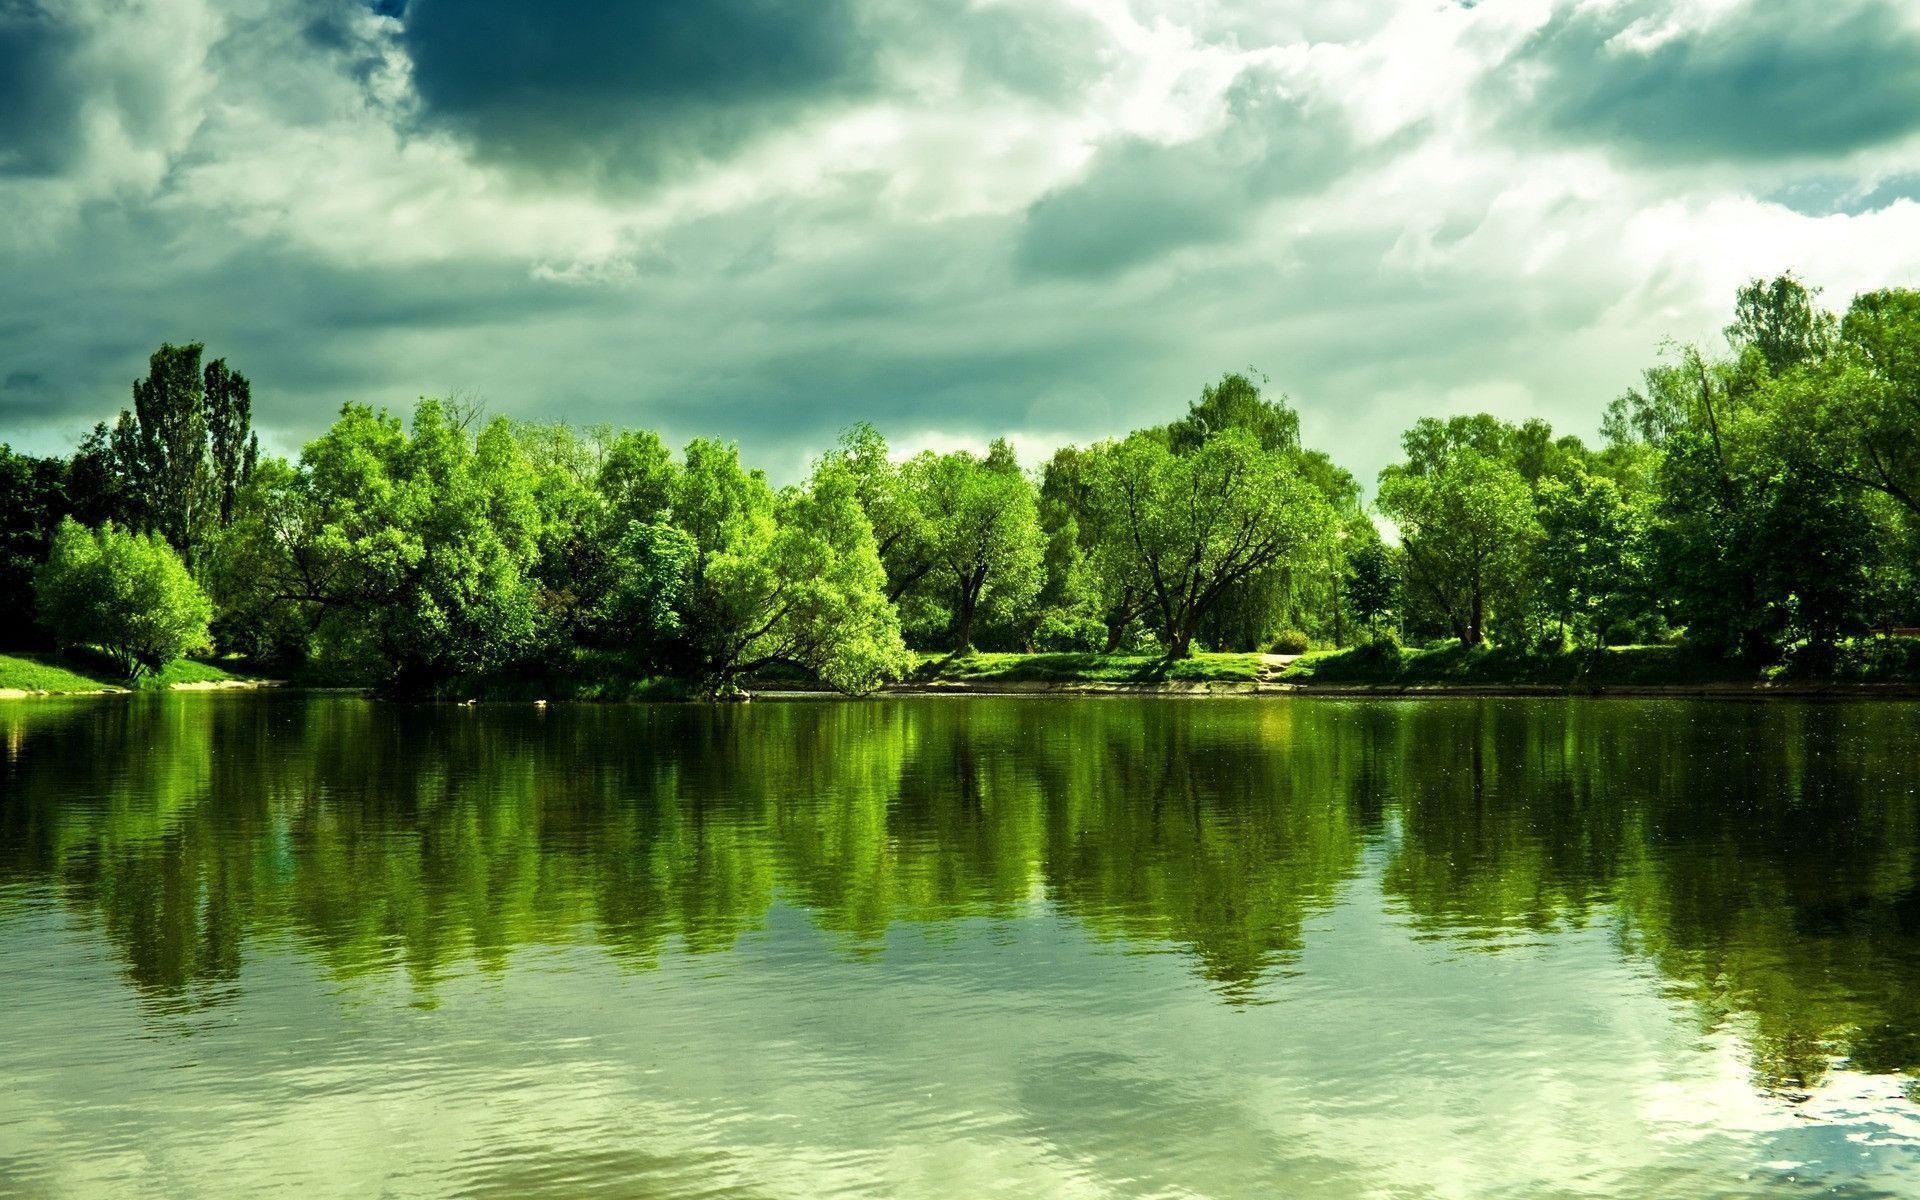 Green Scenery Desktop Wallpapers Top Free Green Scenery Desktop Backgrounds Wallpaperaccess